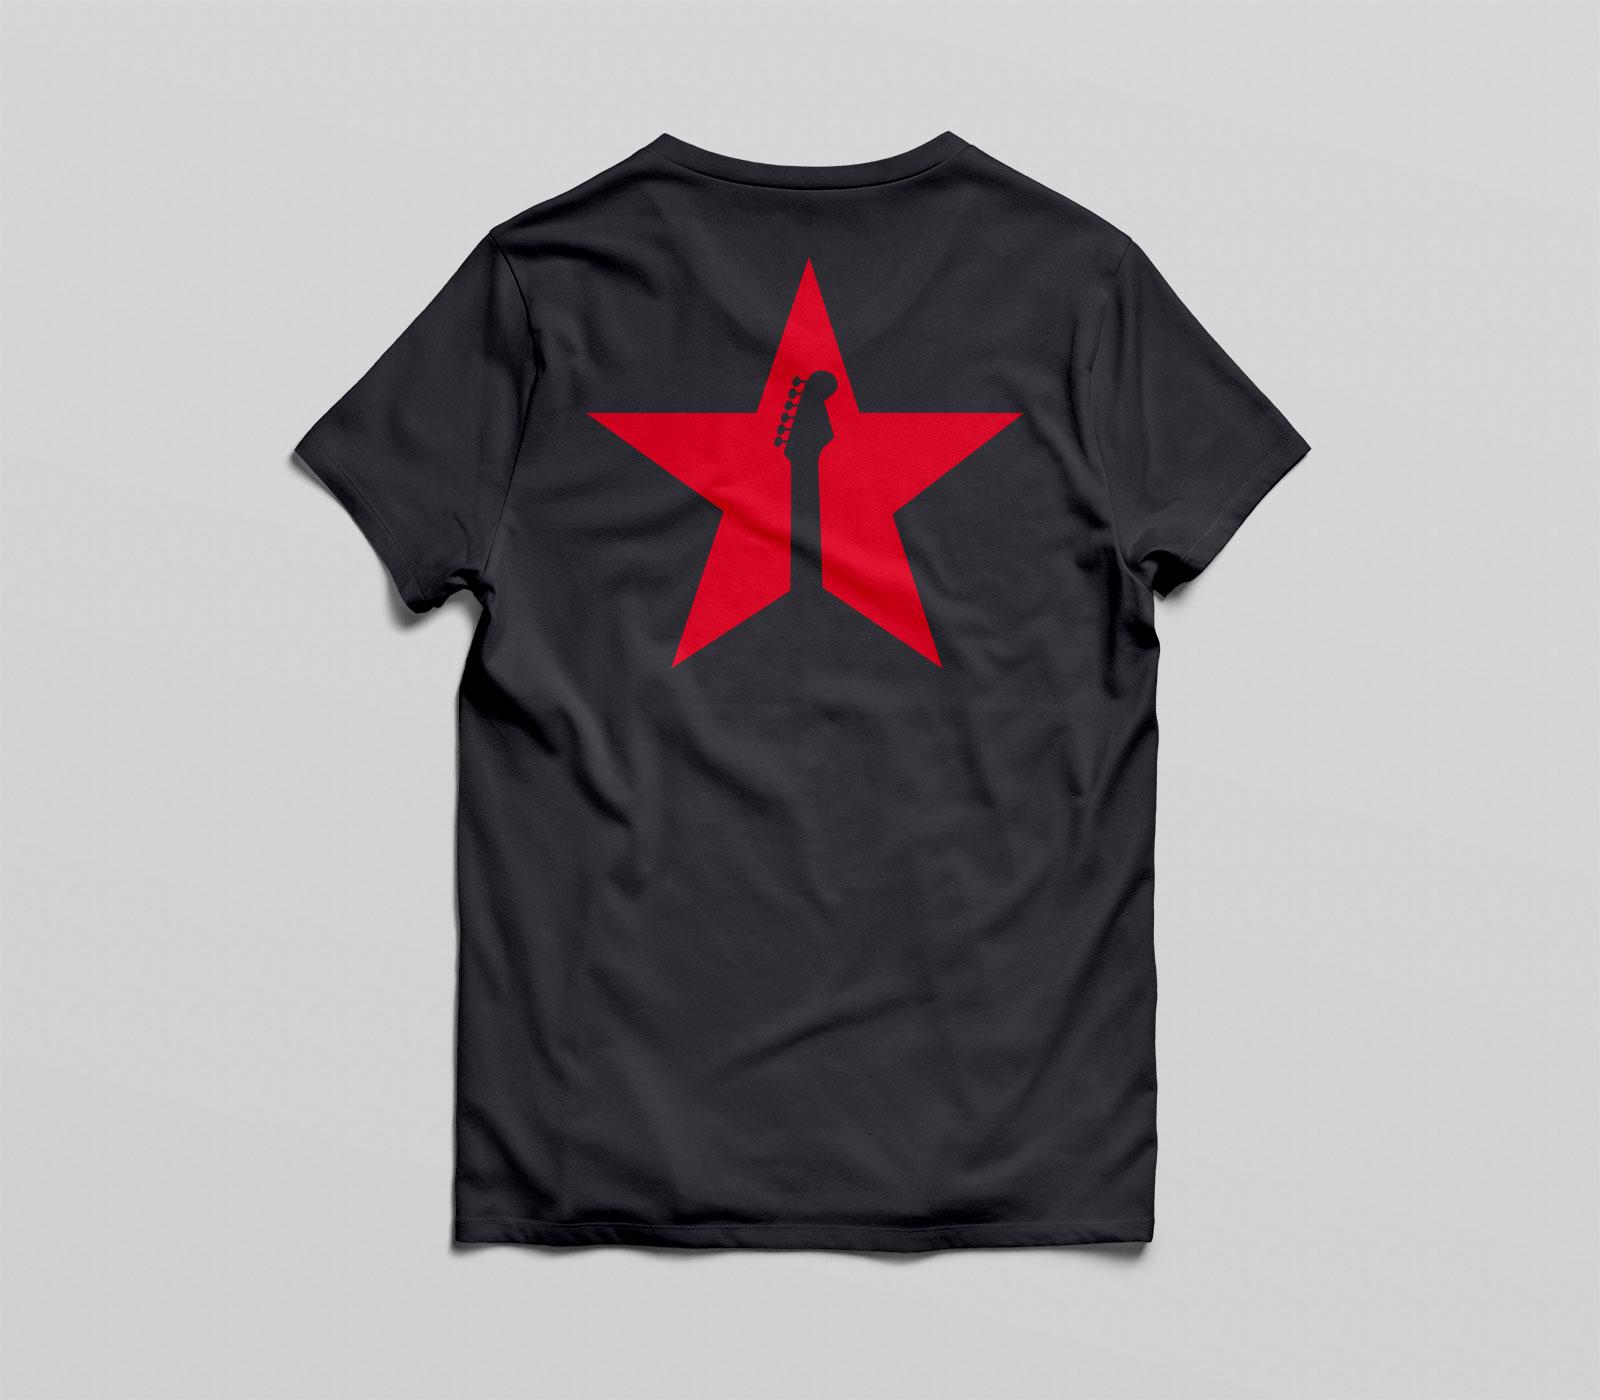 red star tee black back